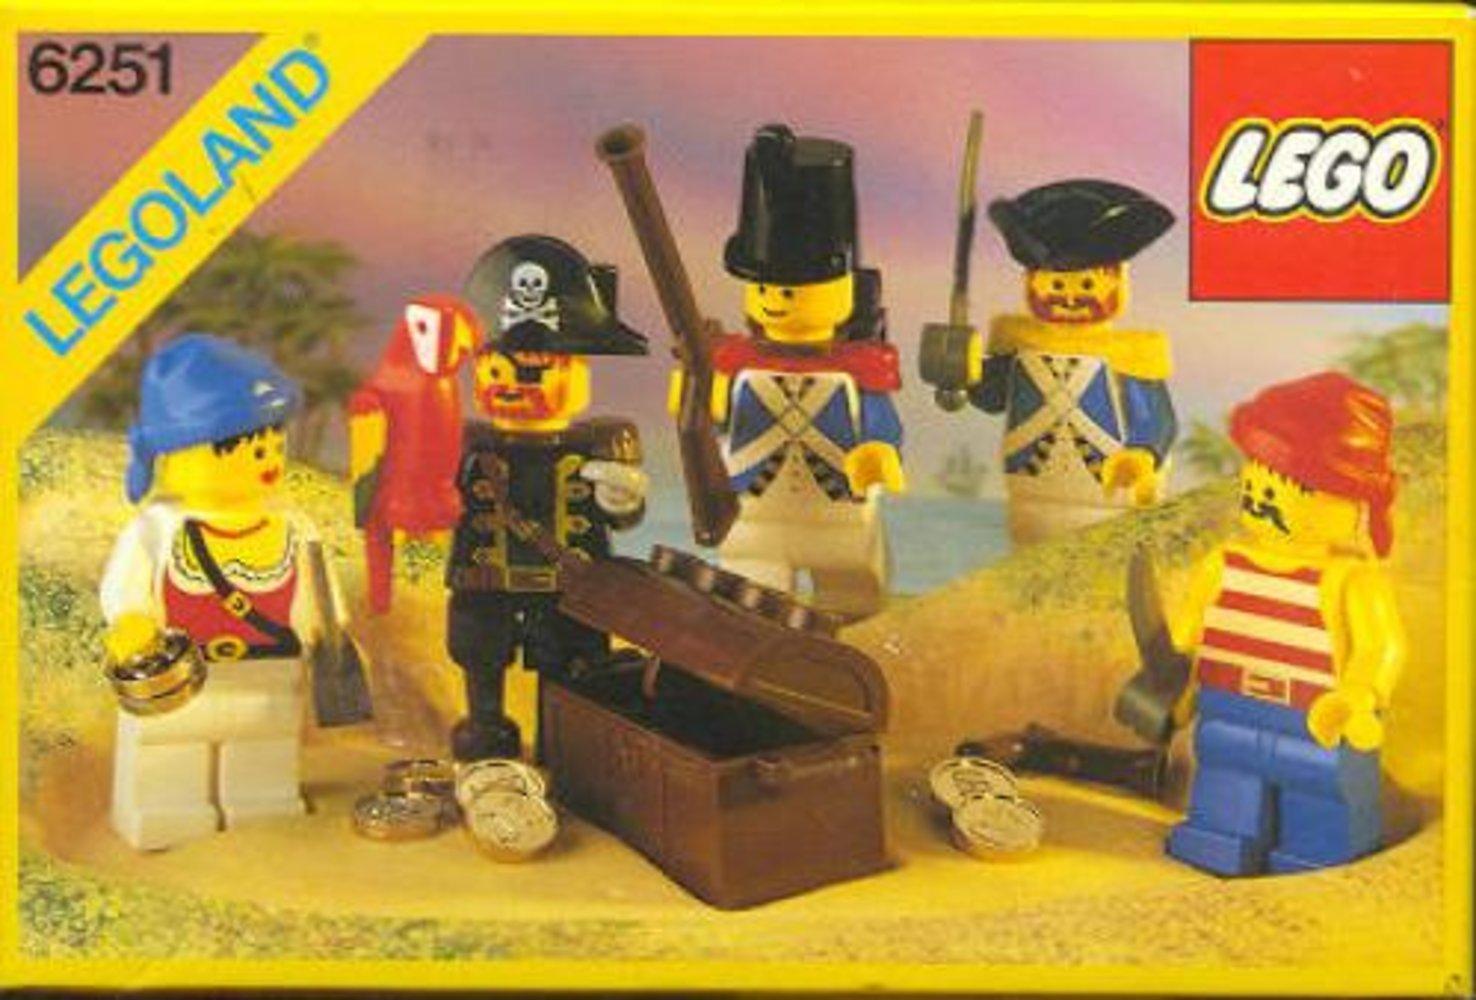 Pirate Mini Figures